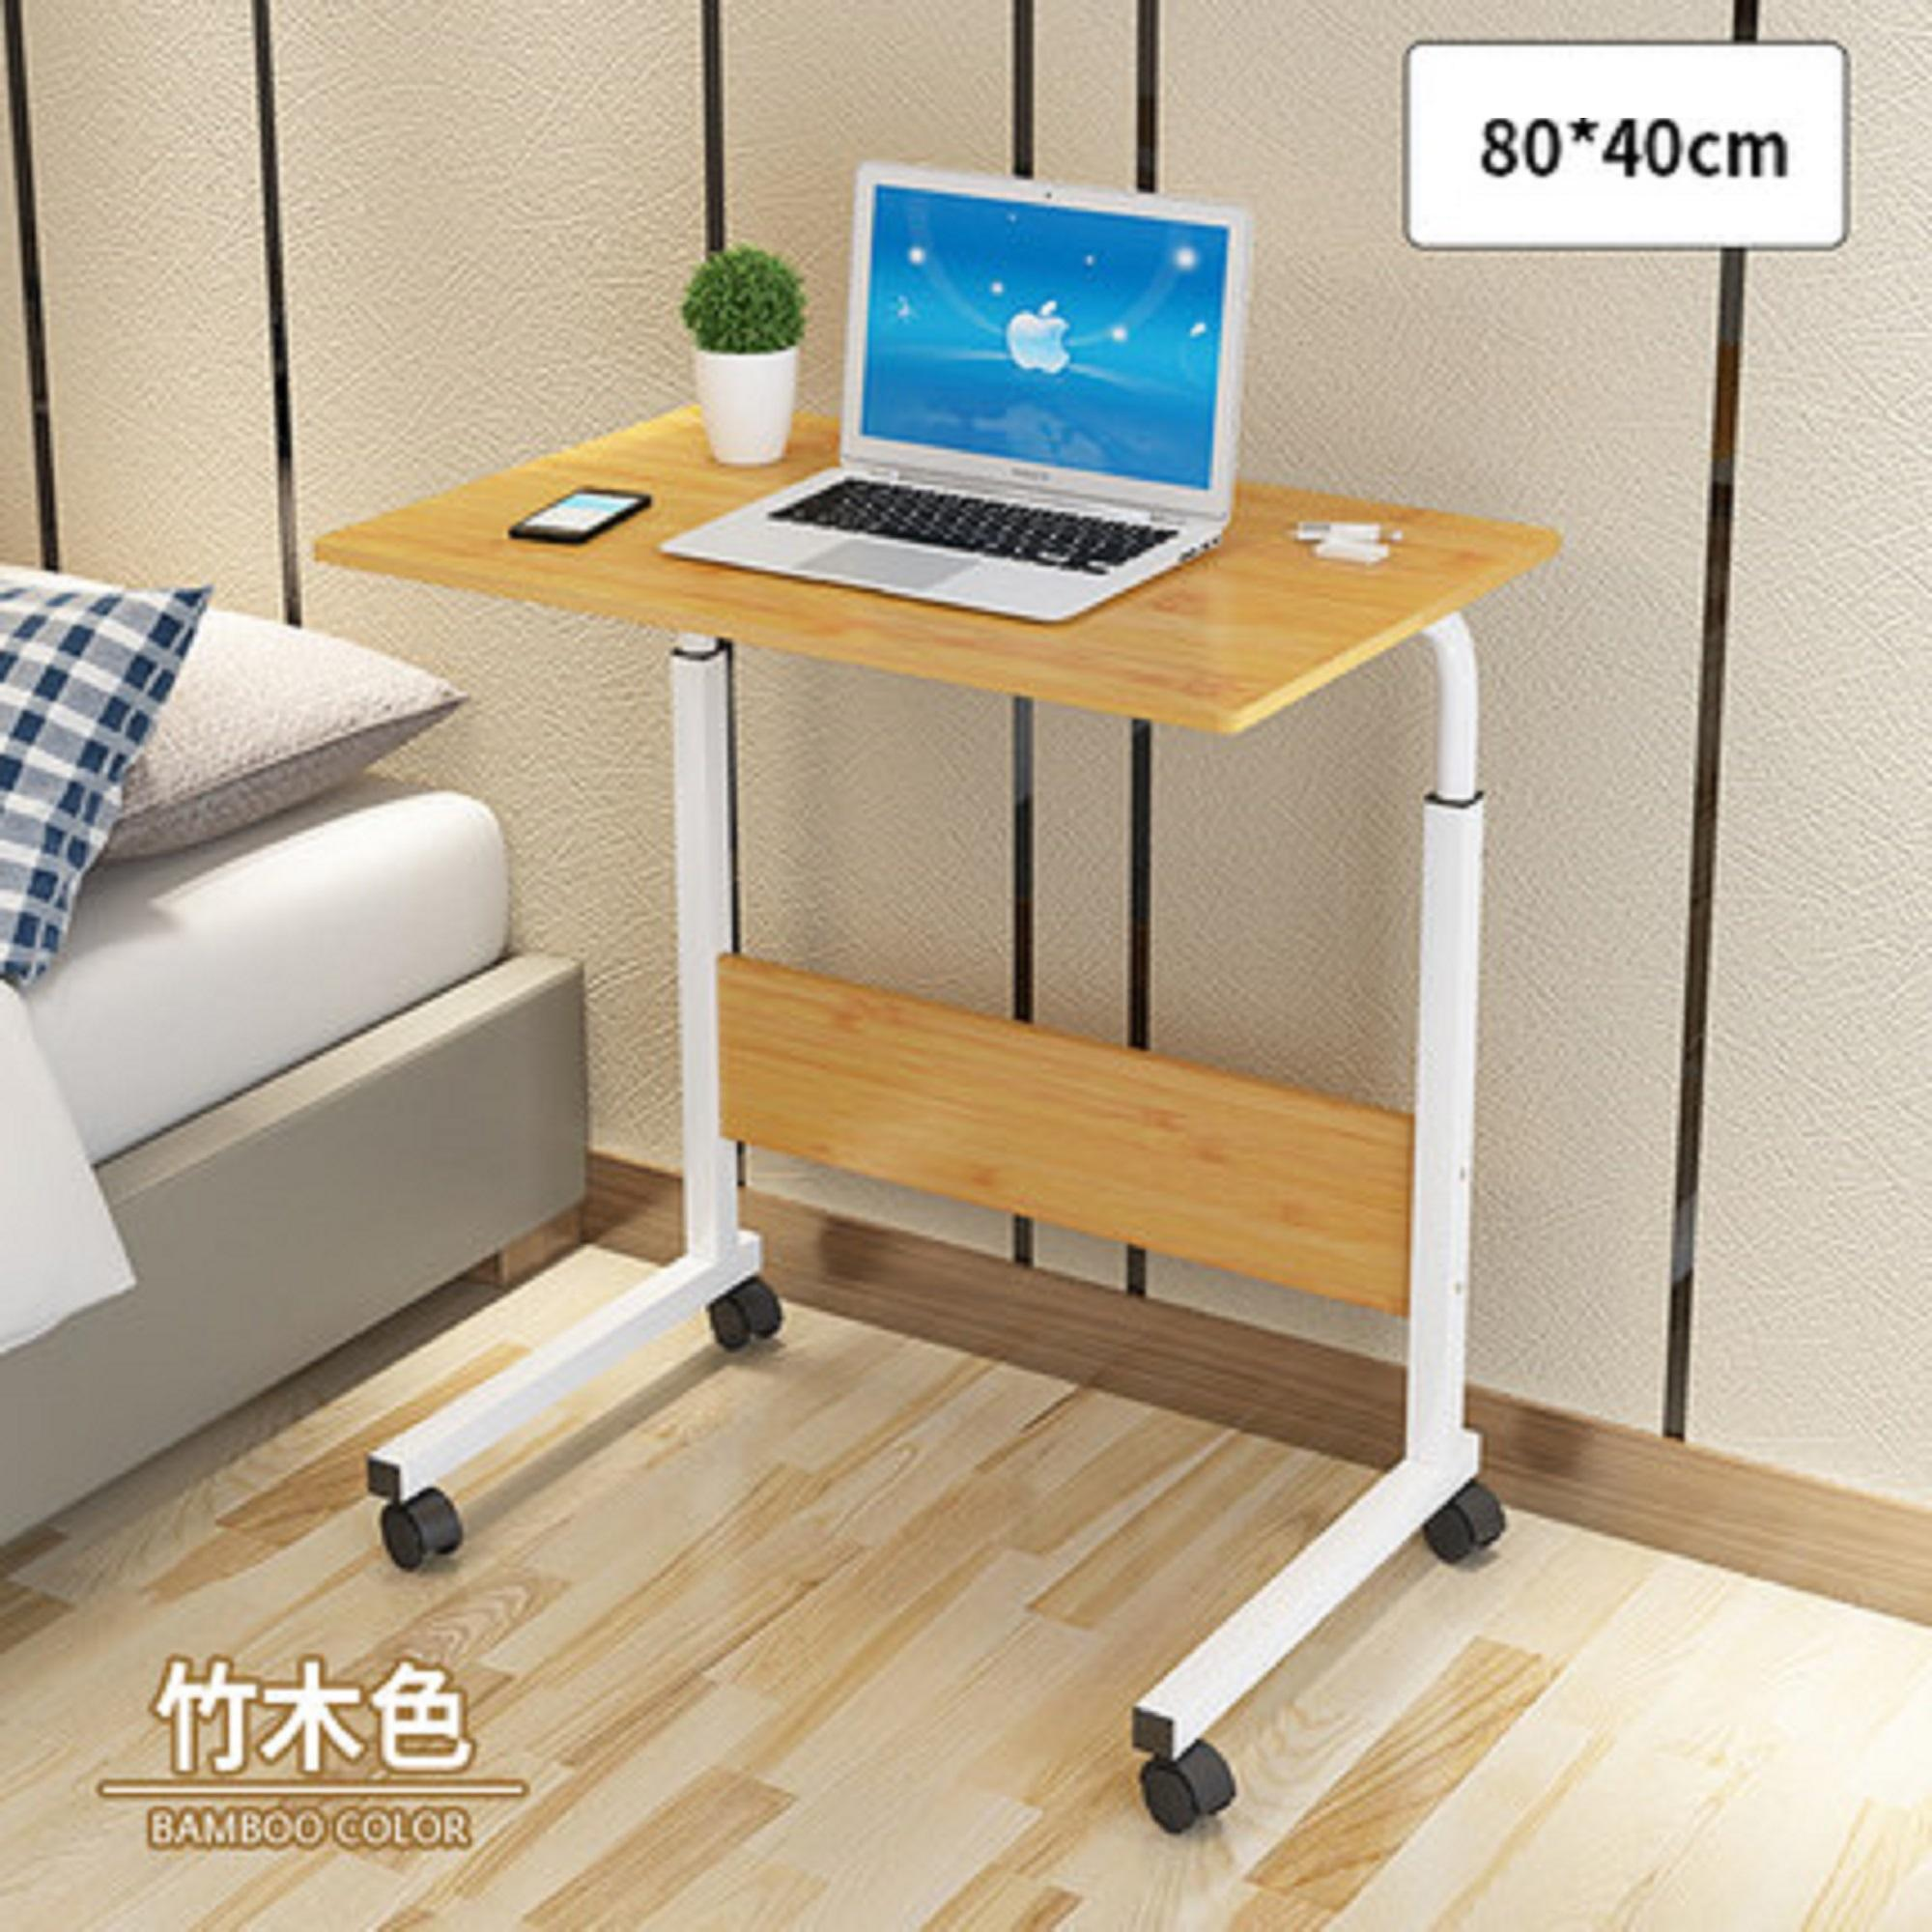 Computer table lazy bedside table desktop home simple desk dormitory 60X40CM